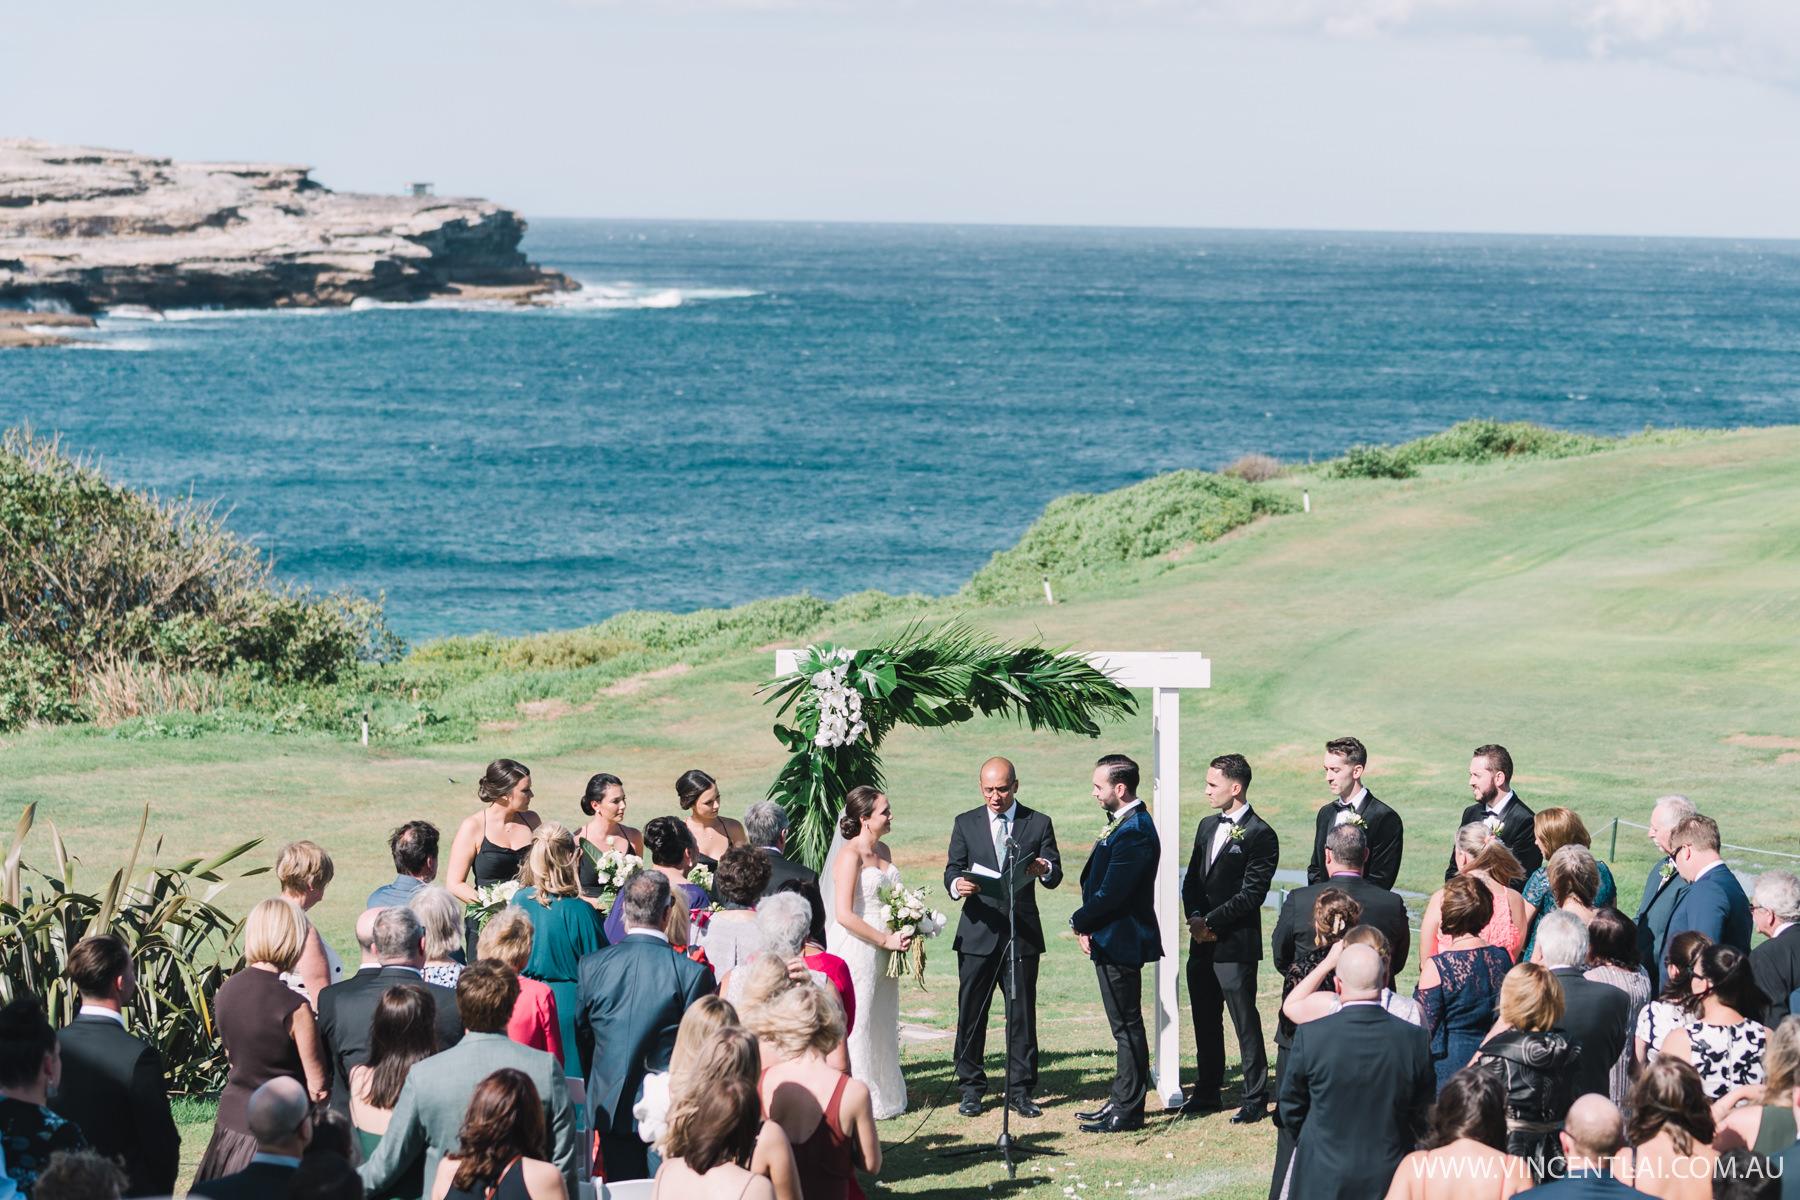 Randwick Golf Club Wedding Ceremony